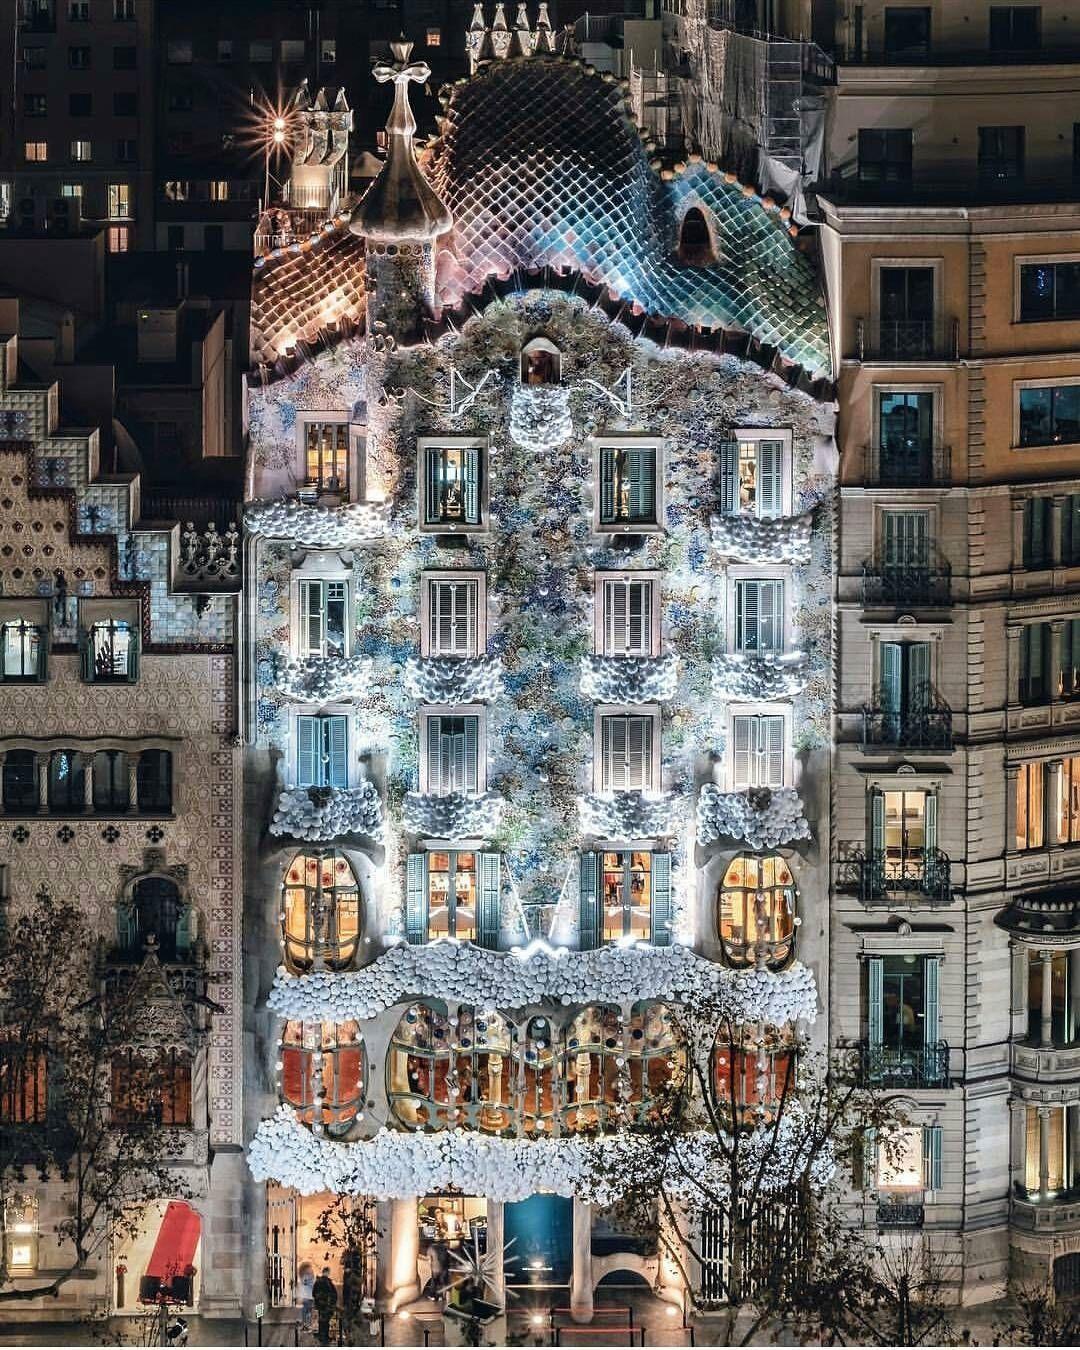 Casa Batlló Gaudi Barcelona Gaudi Gaudi Architecture European Architecture